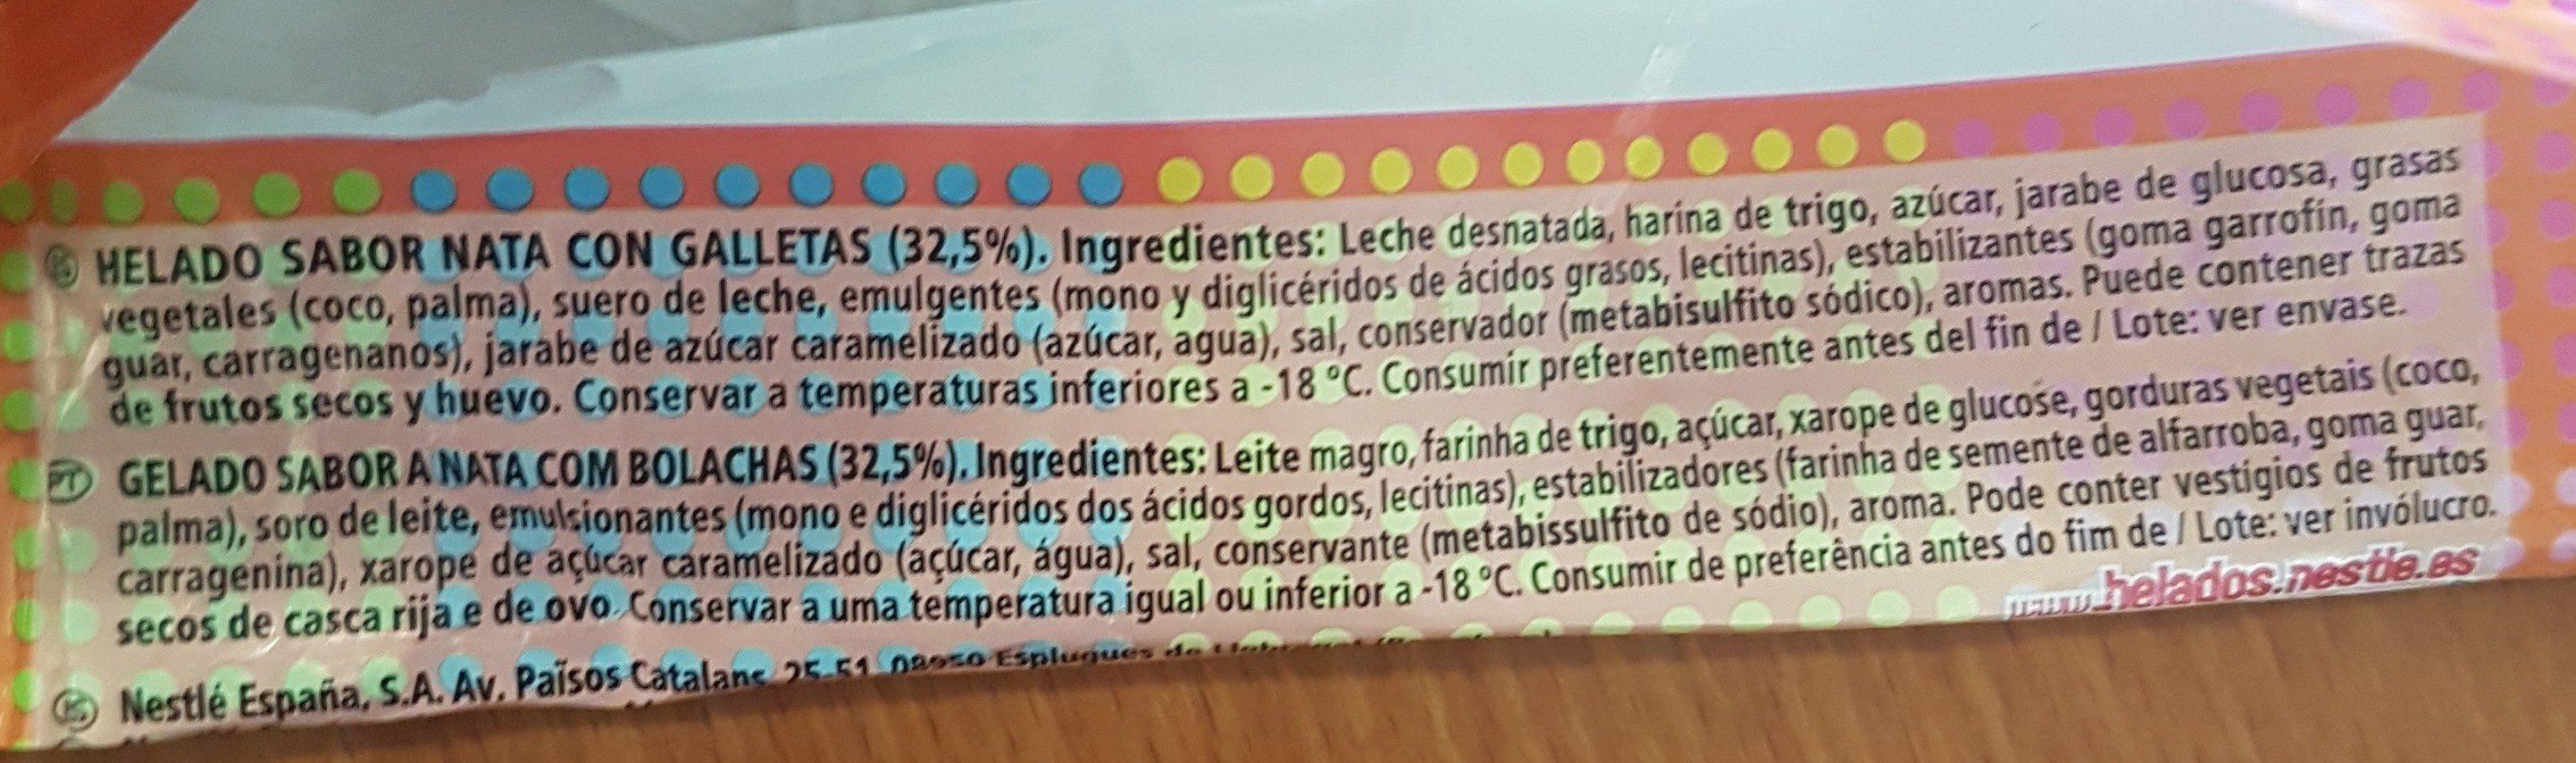 Sandwich Nata - Ingredients - en